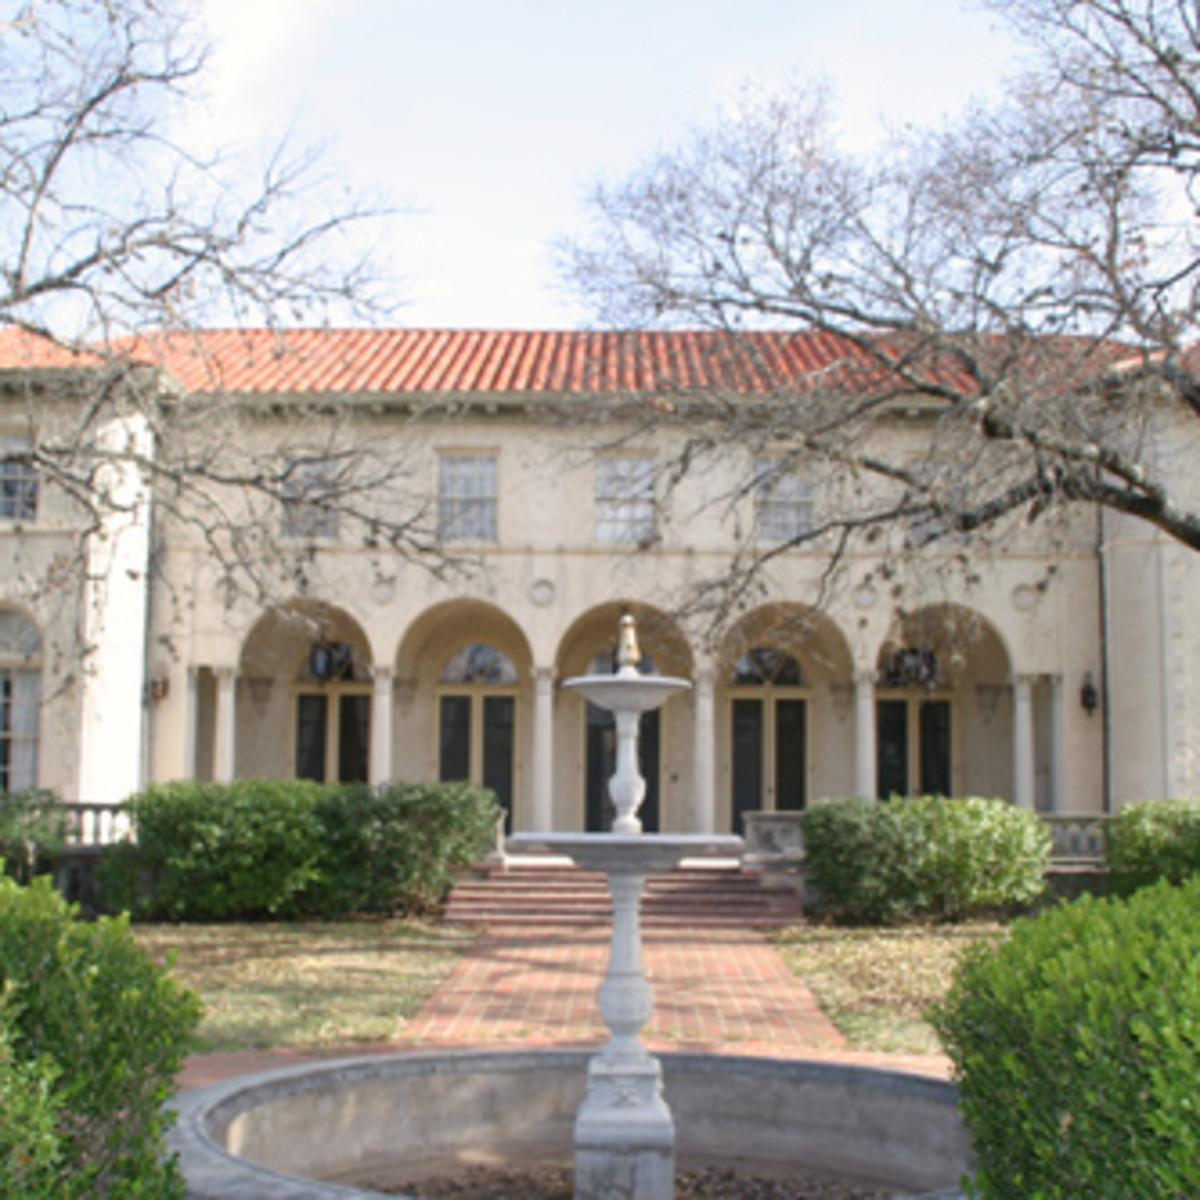 Austin_photo: places_unique_commodore perry estate_exterior